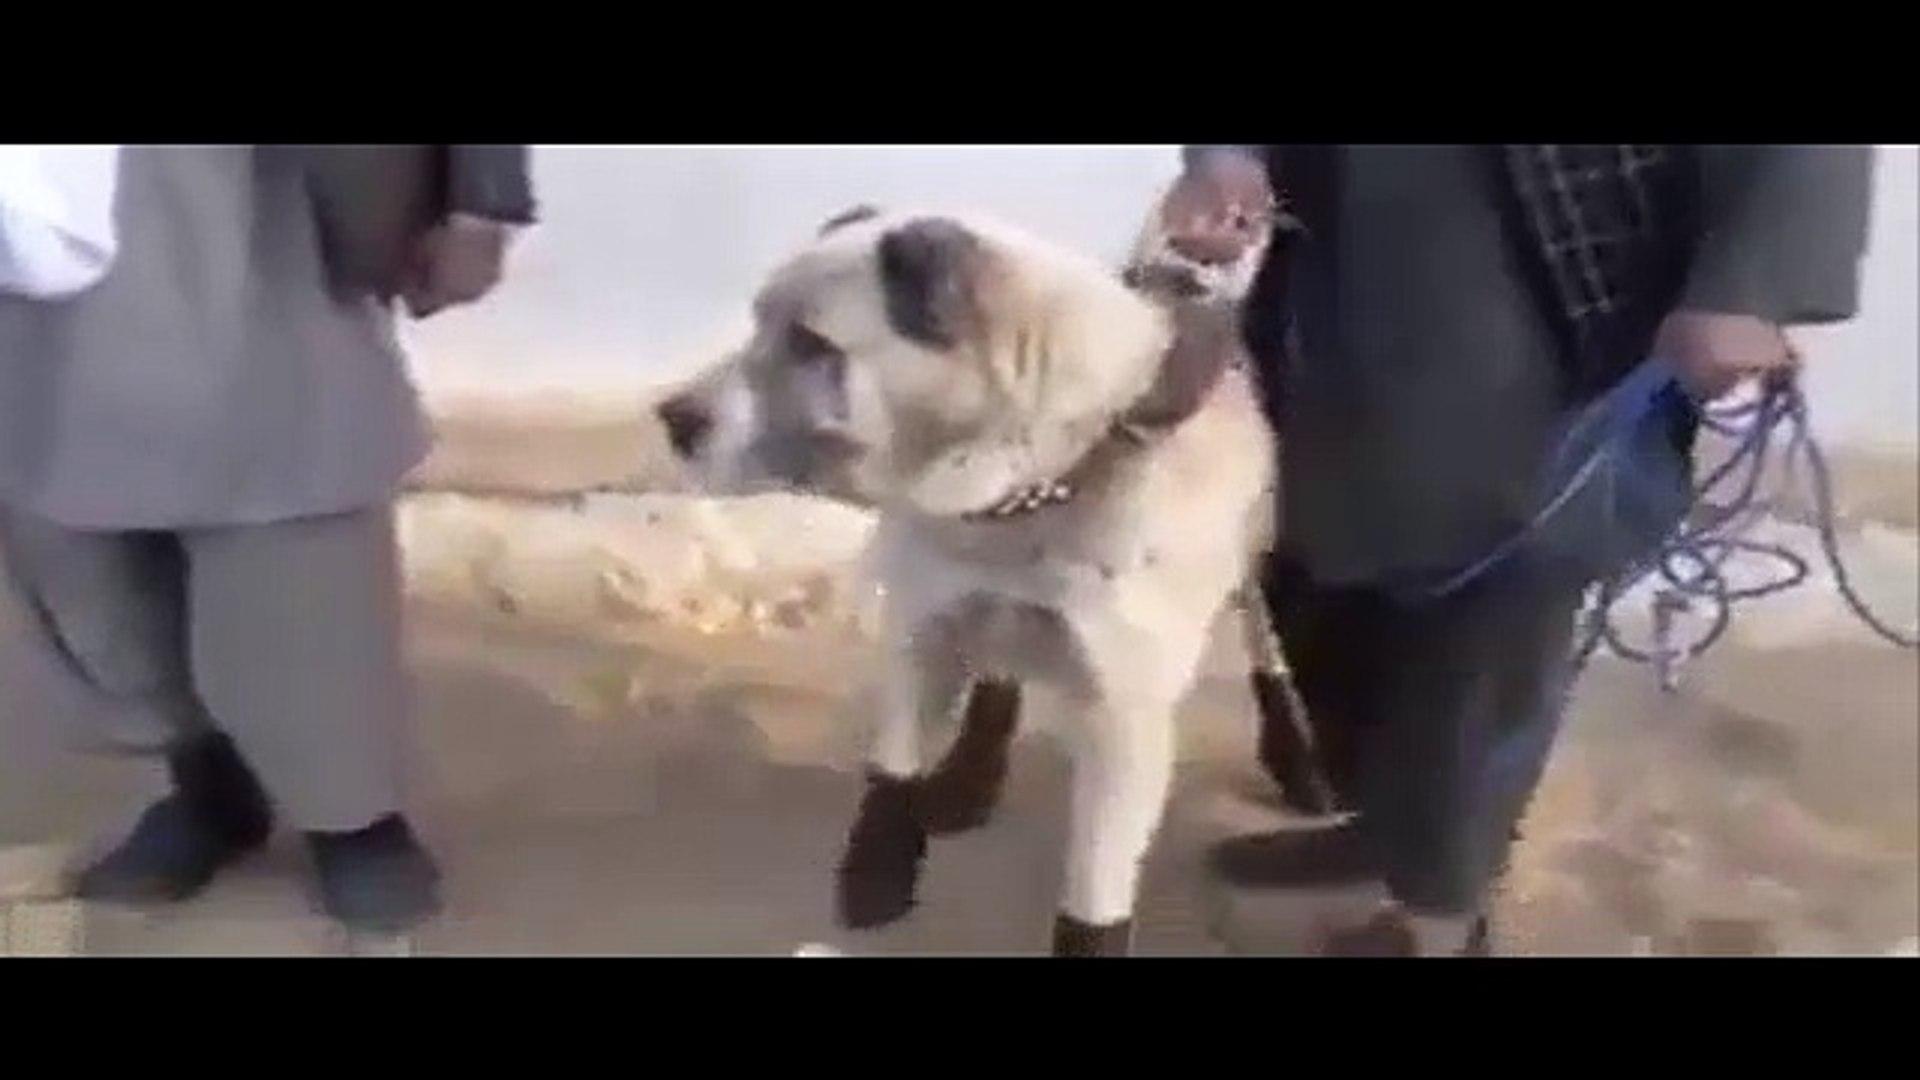 AFGANiSTANDA ATLETiK ALABAY COBAN KOPEGi - ALABAi SHEPHERD DOG